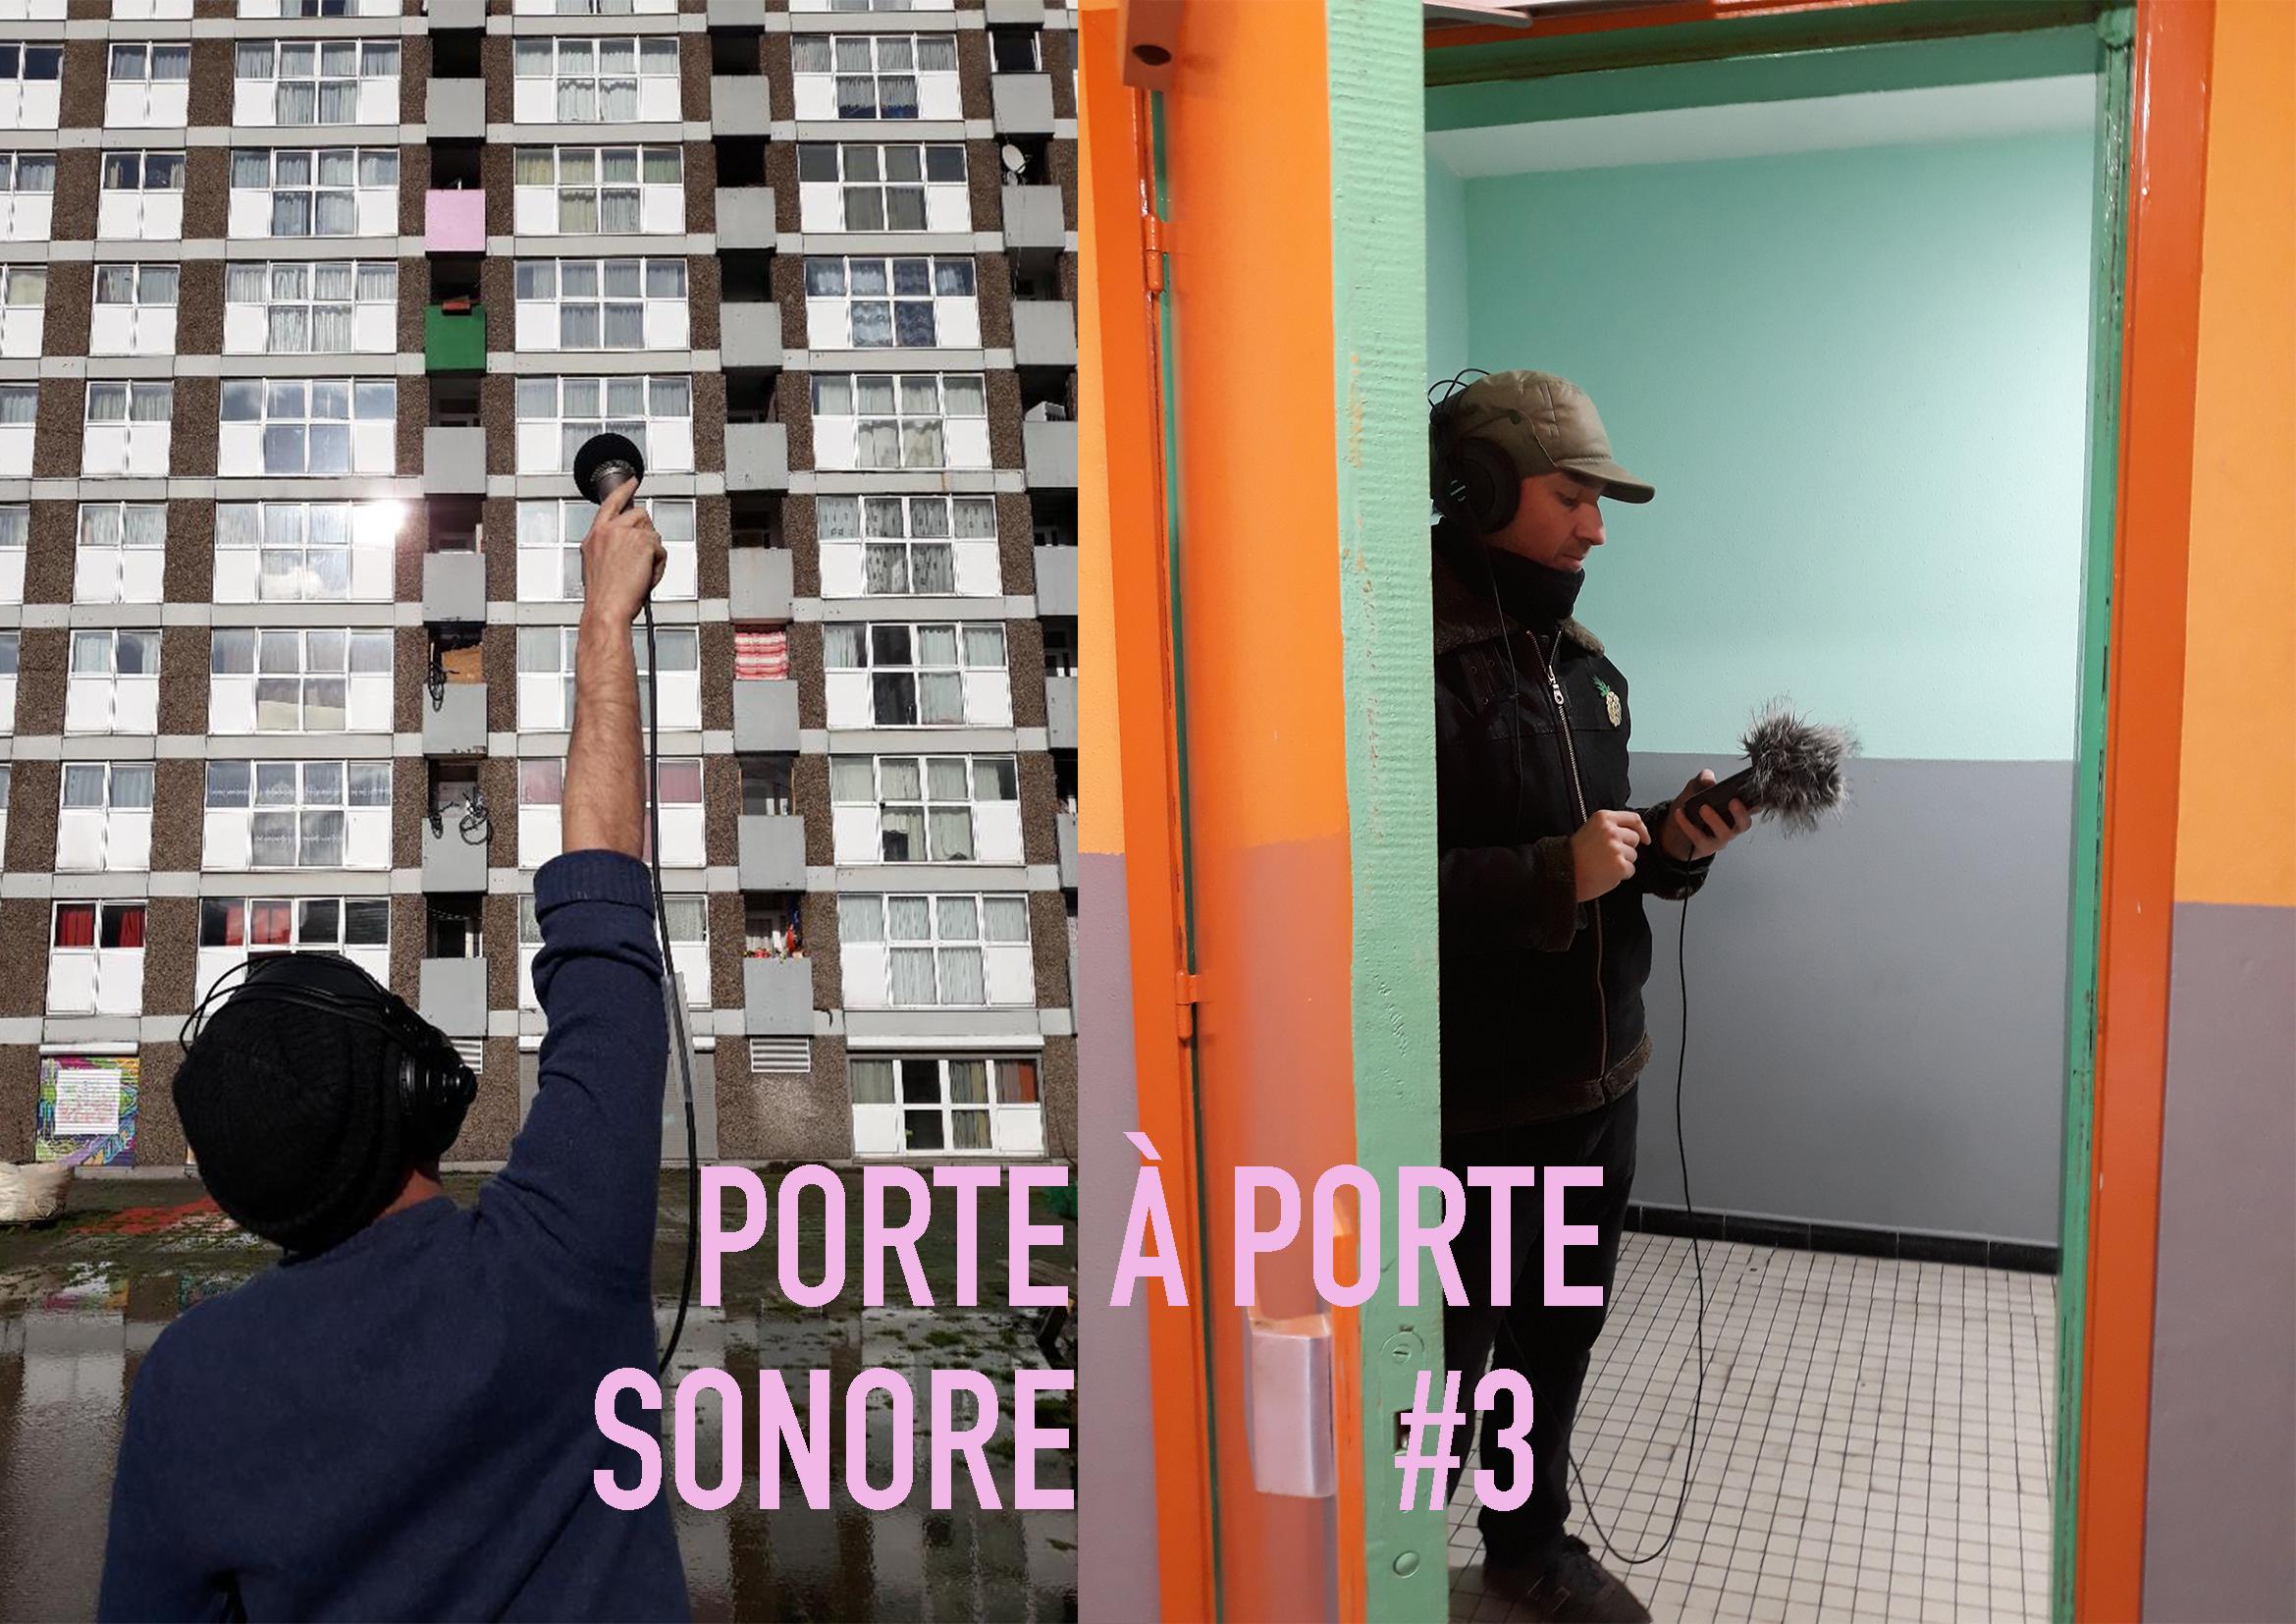 Porte à Porte Sonore #3   Samedi 24 juillet 2021 à 18h    sur Radio Campus 92,1fm    www.radiocampus.be